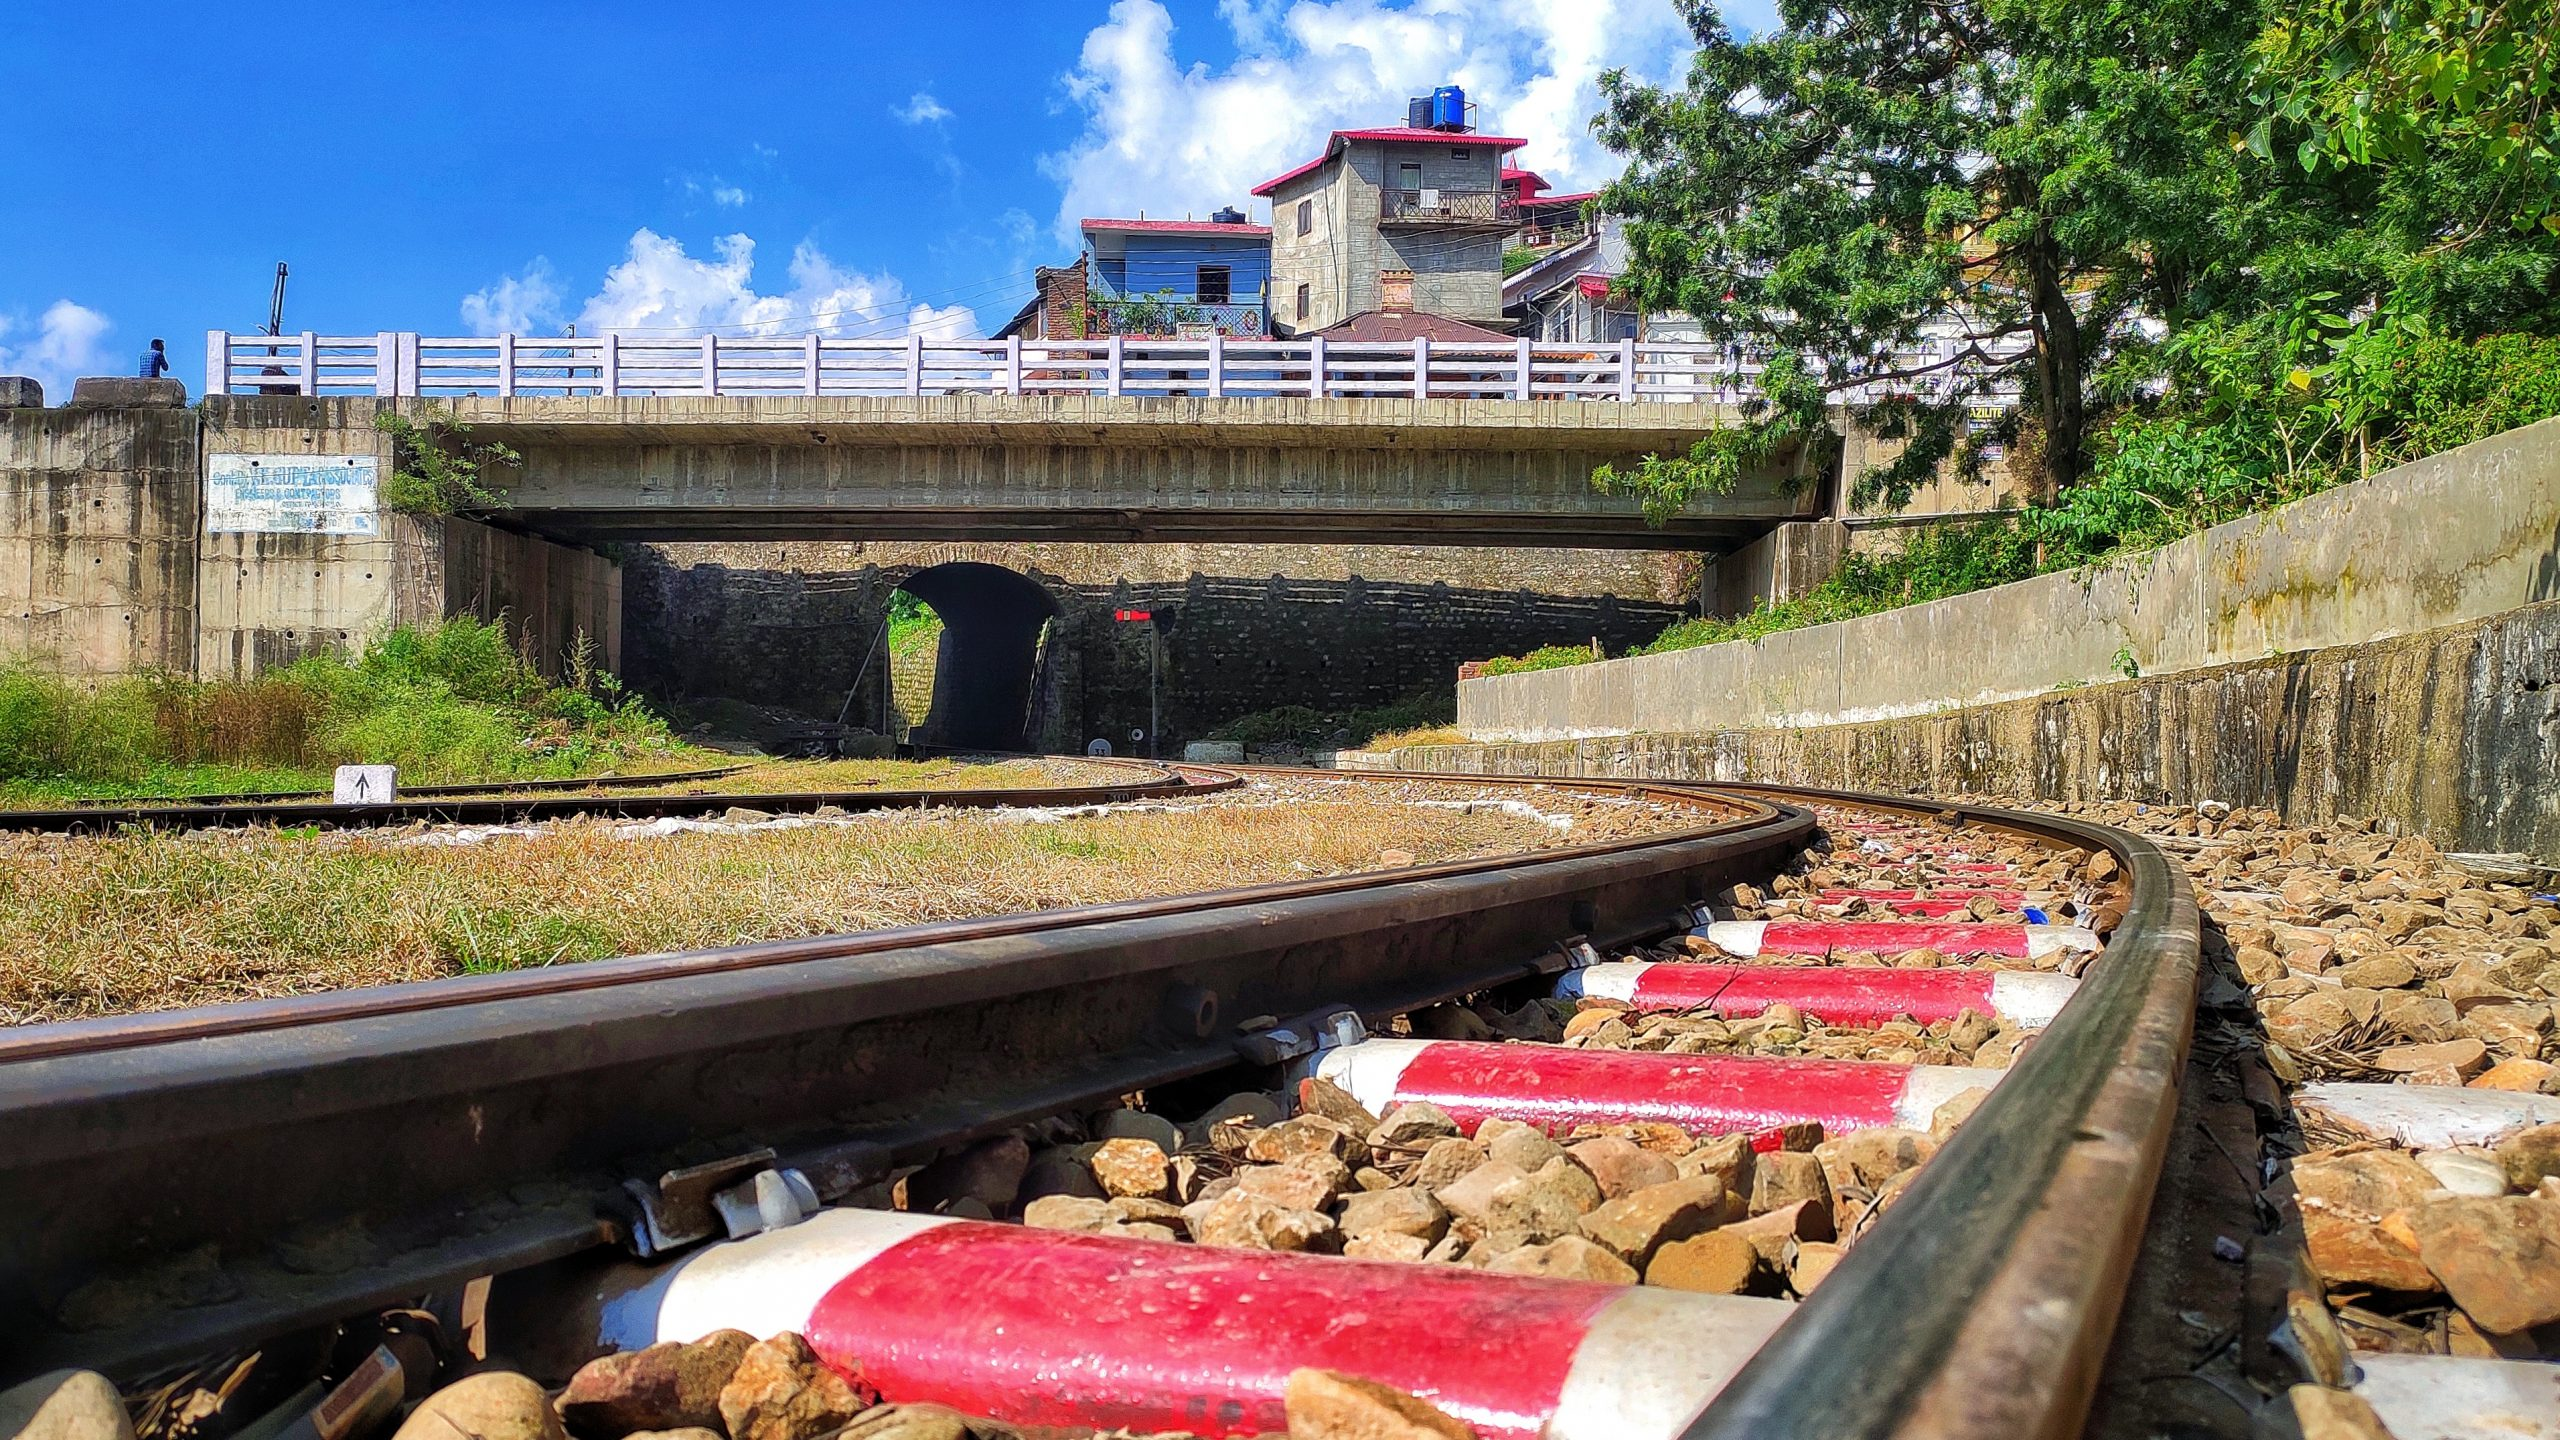 Indian railway track